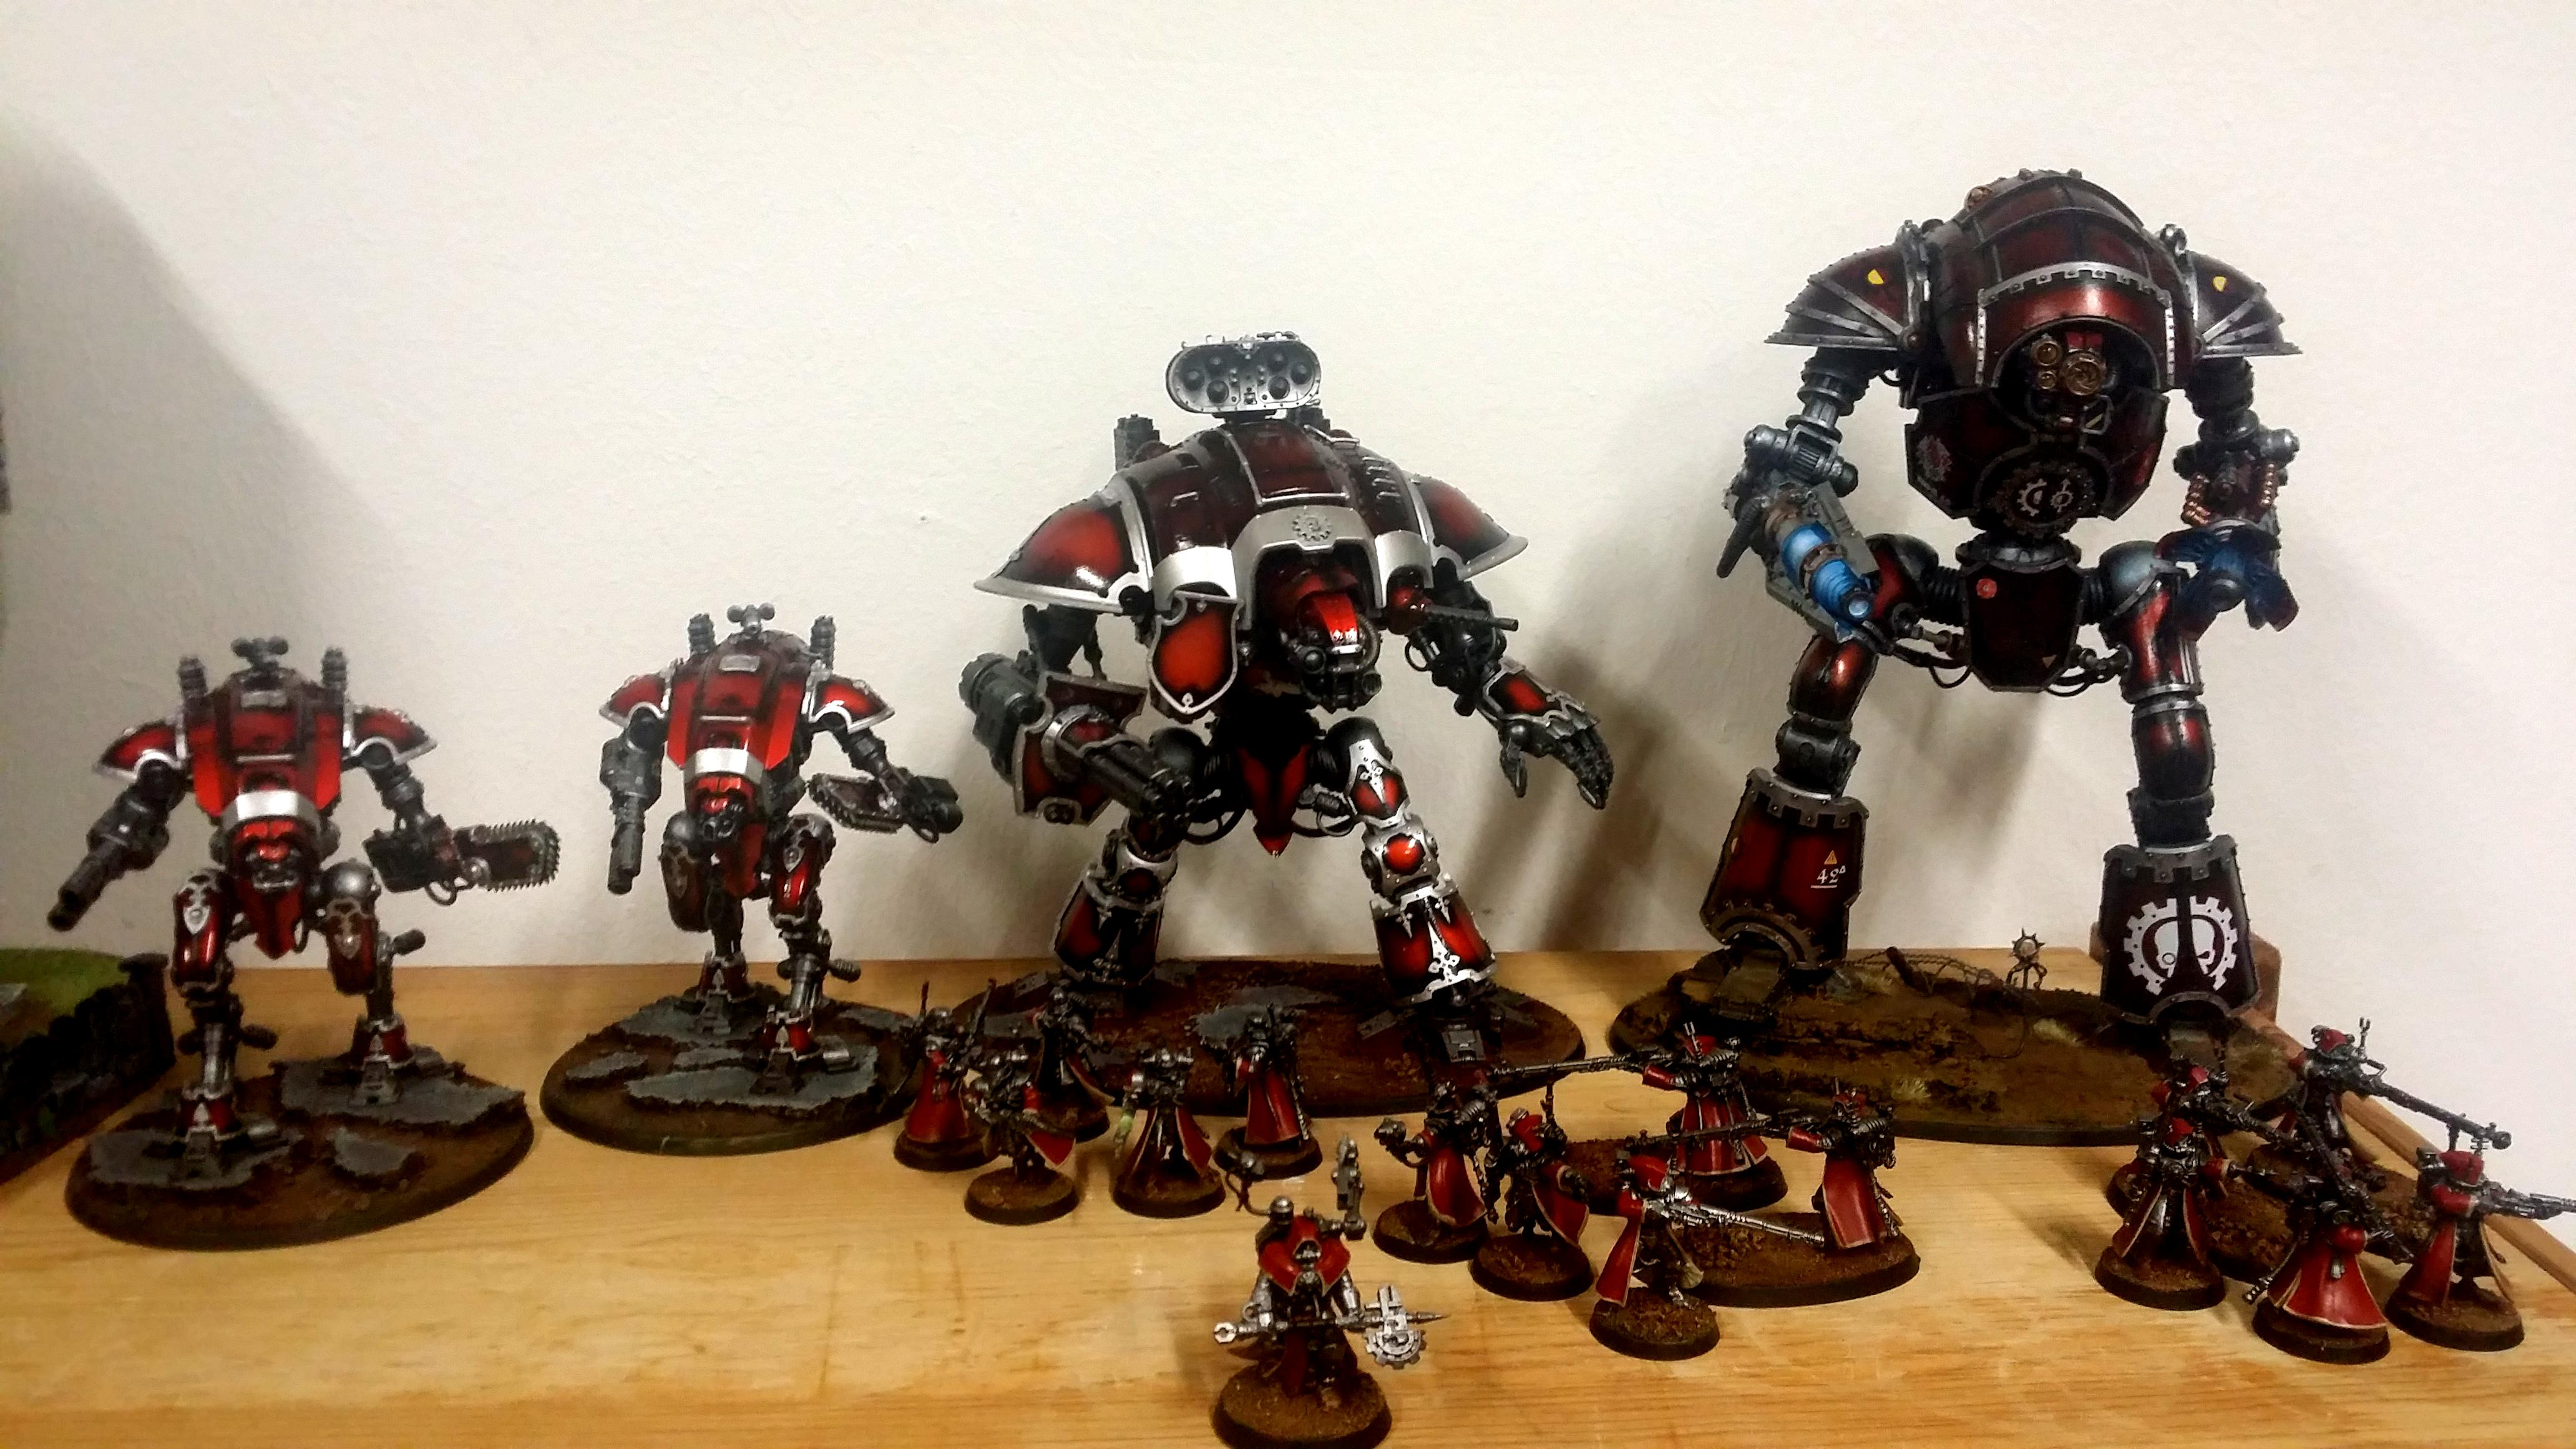 Imperial Knights, Questor Mechanicus, Taranis, Warhammer 40,000, Work In Progress